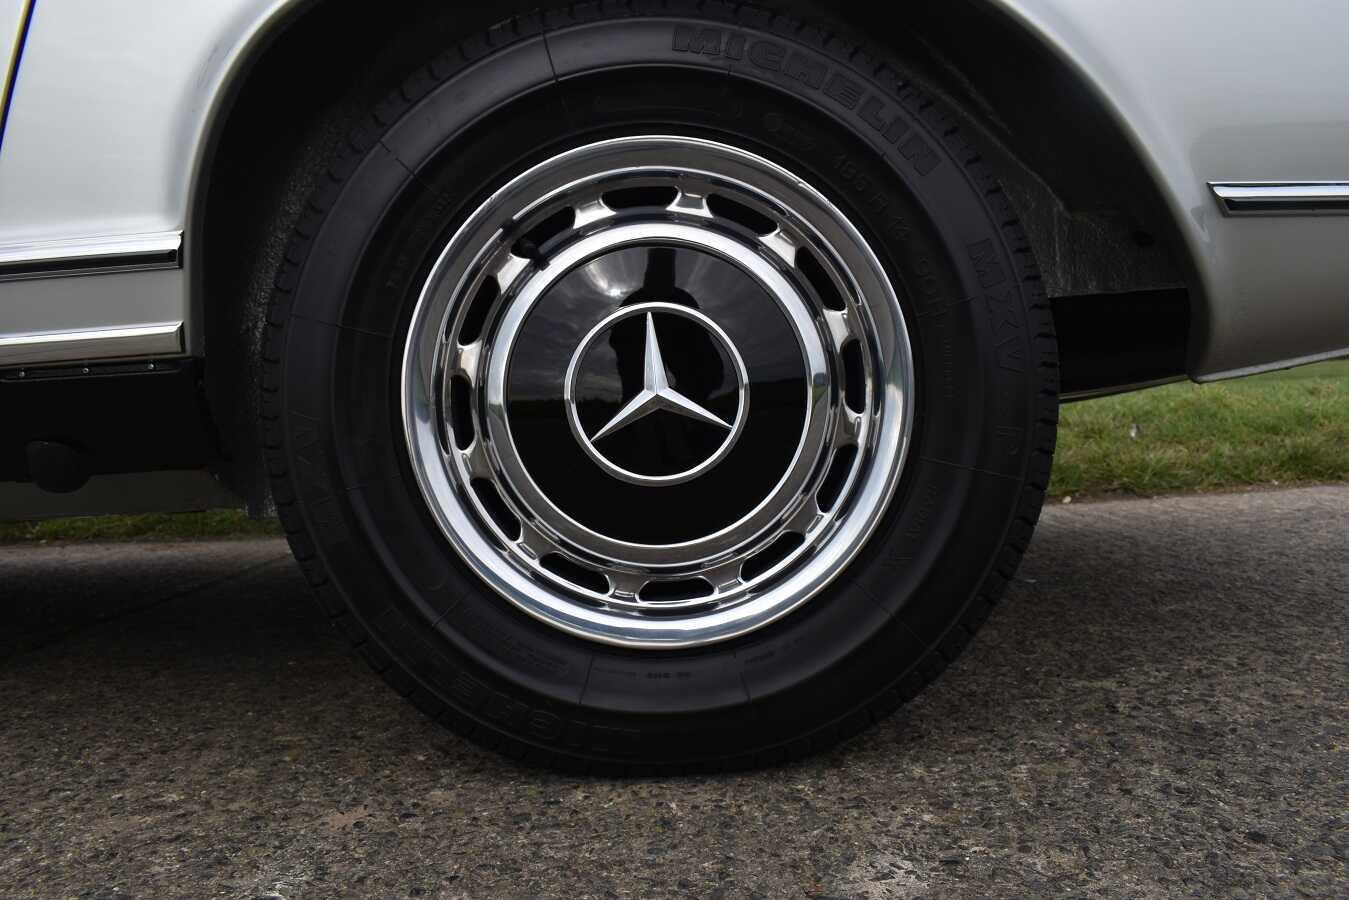 1970 Mercedes 280SL/8 in Silver Metallic